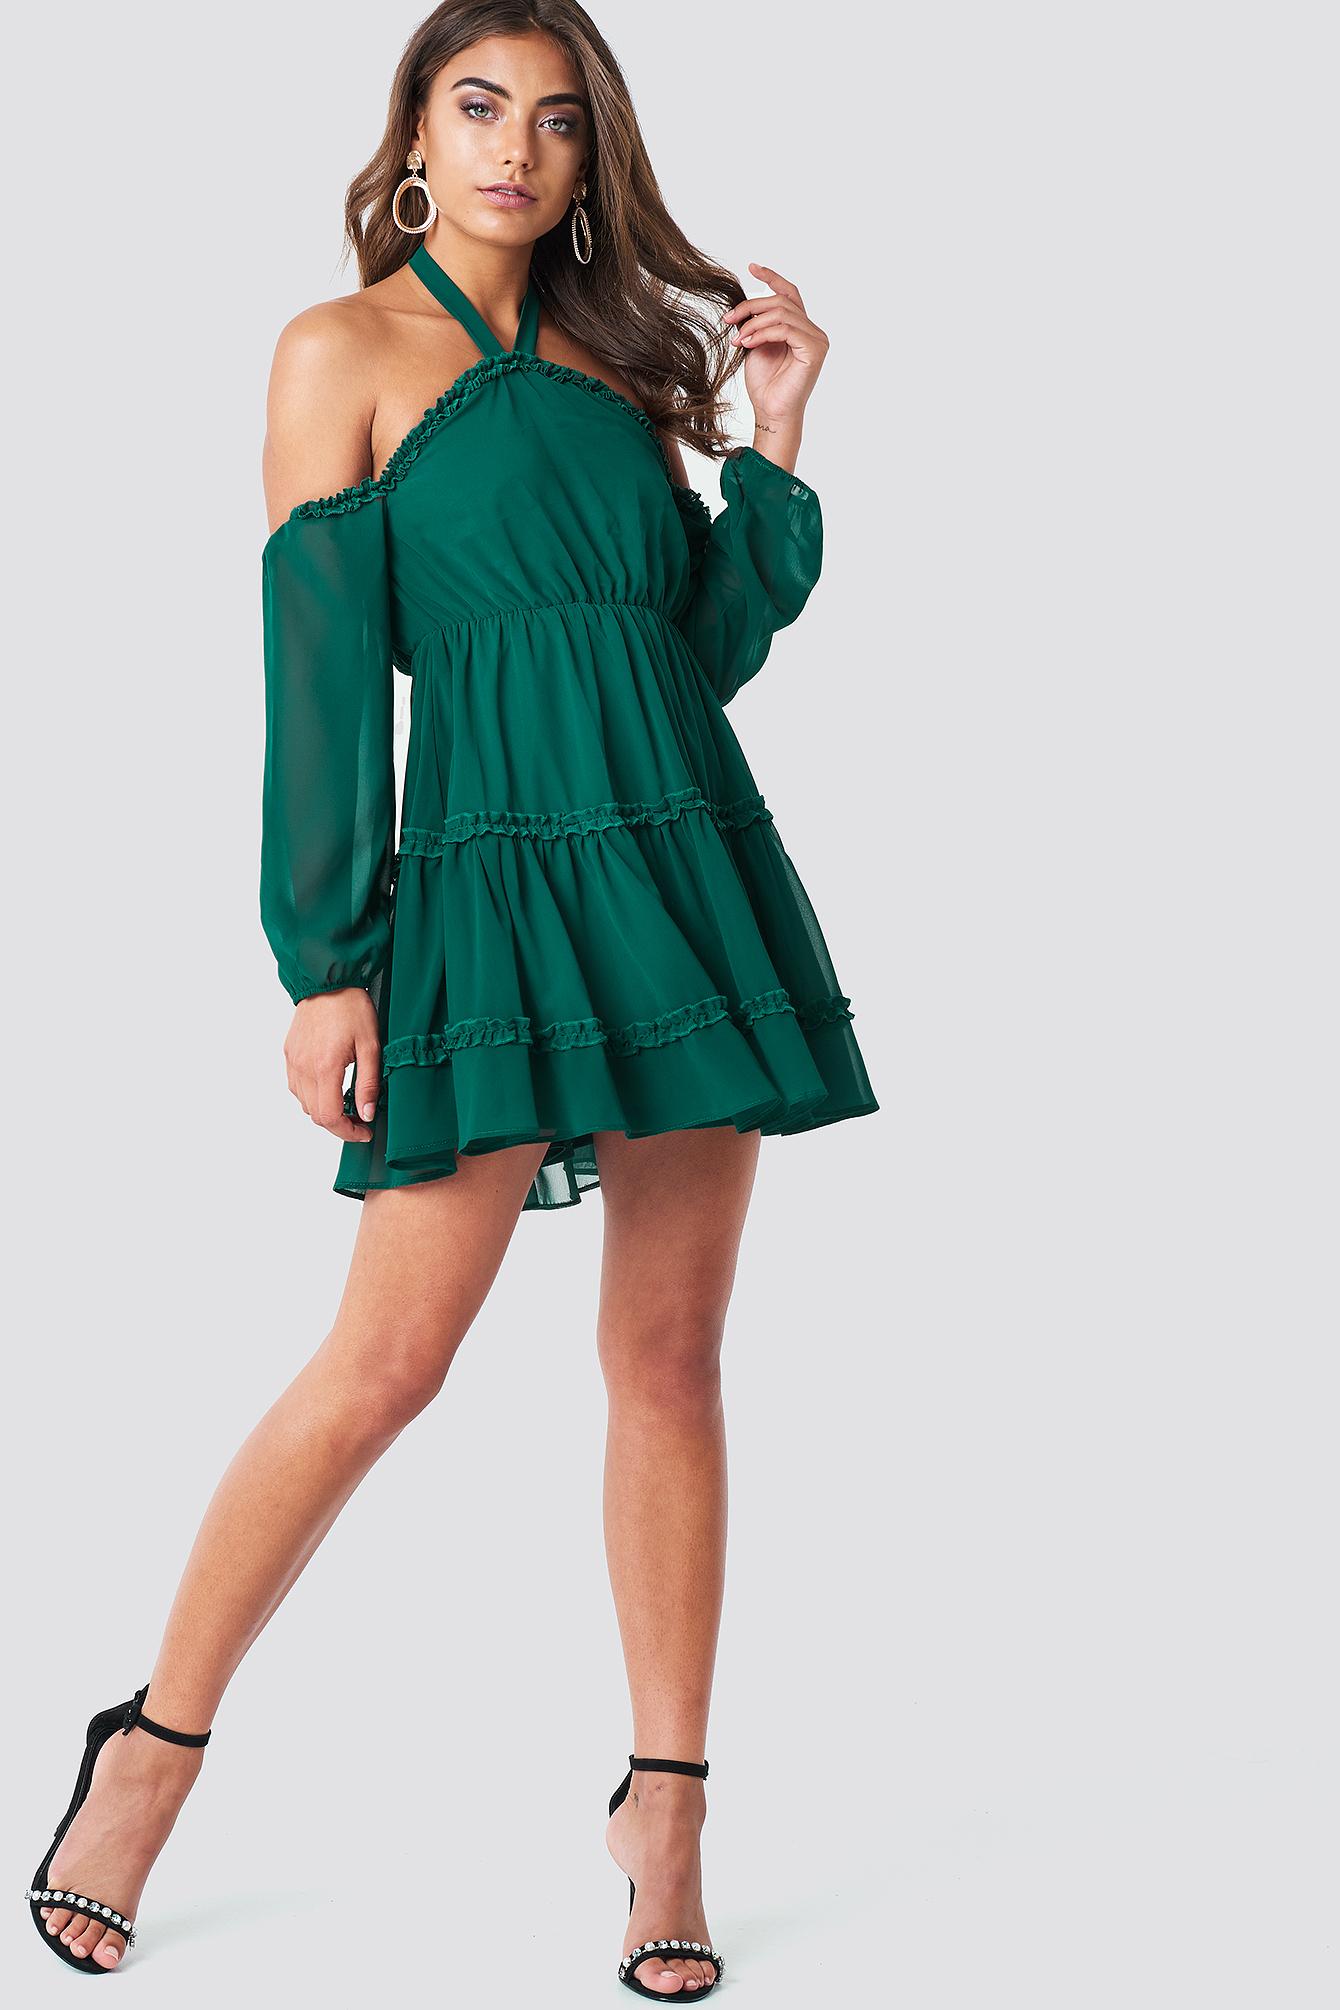 Off Shoulder Dresses with Sleeves